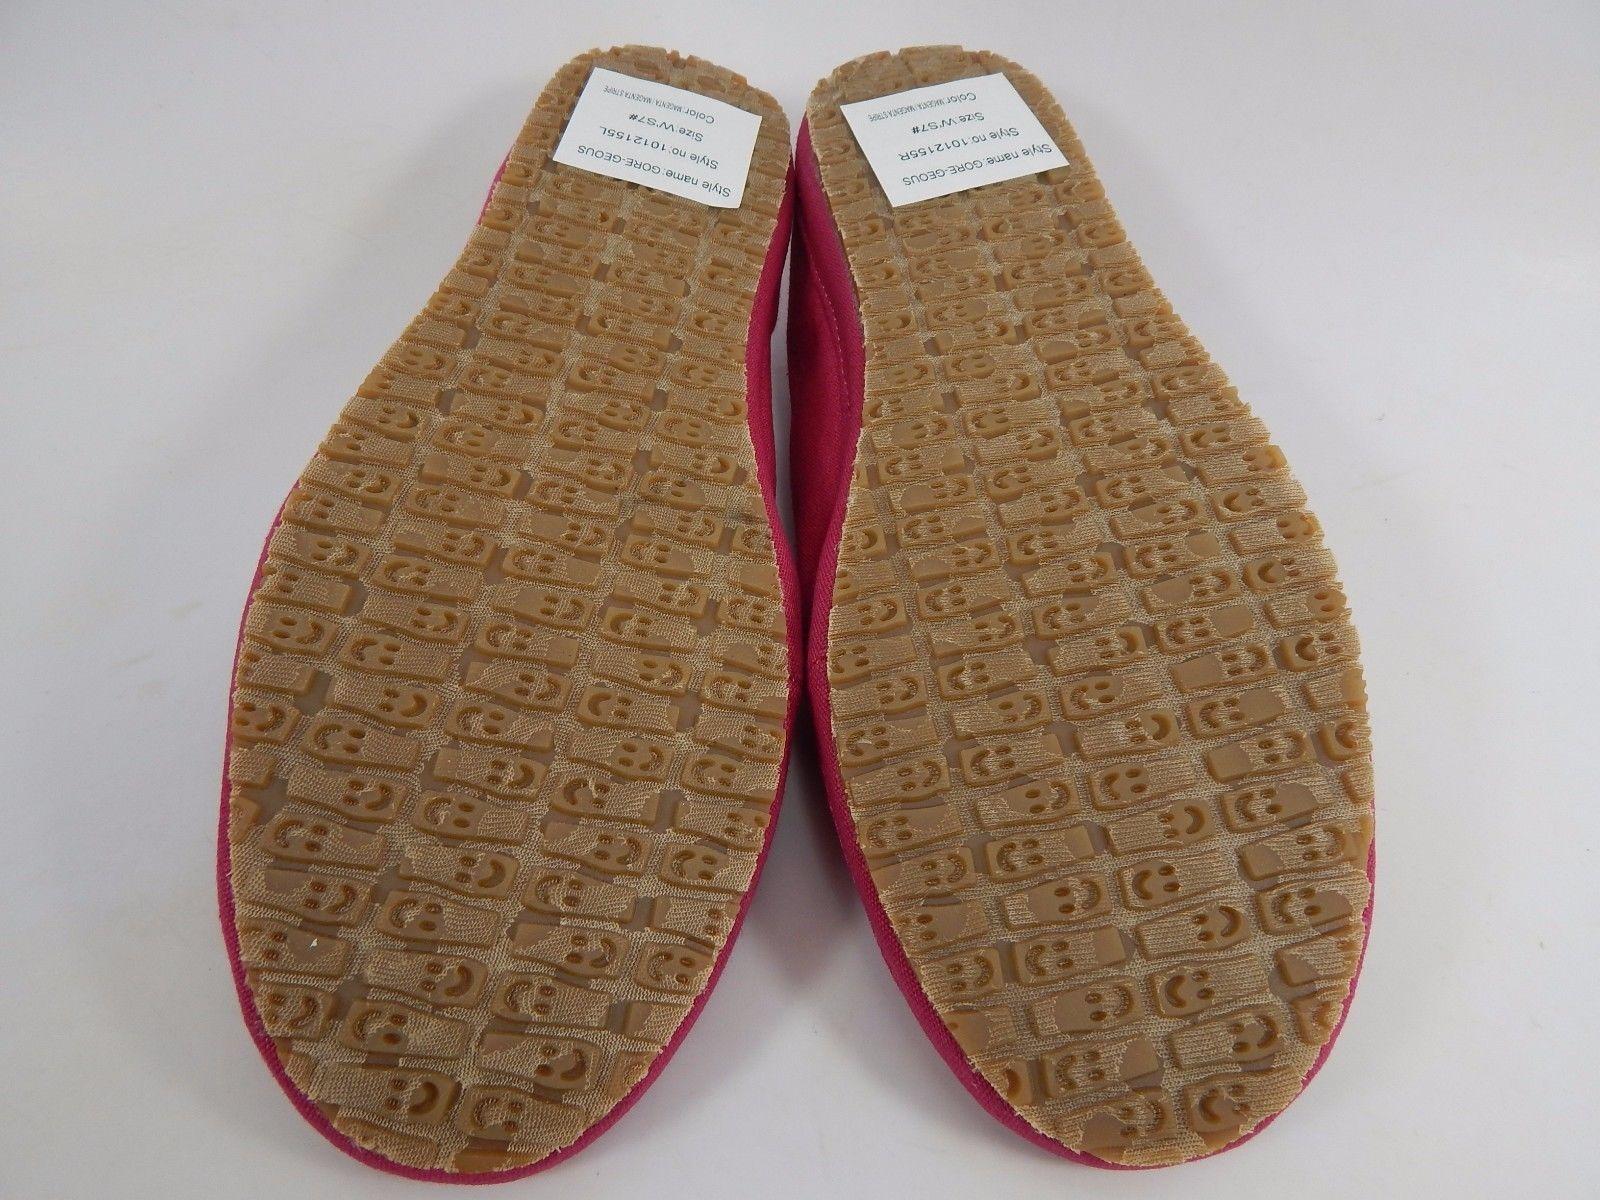 Sanuk Gore-Geous Magenta / Stripe Women's Casual Sandals Shoes Size US 7 M (B)